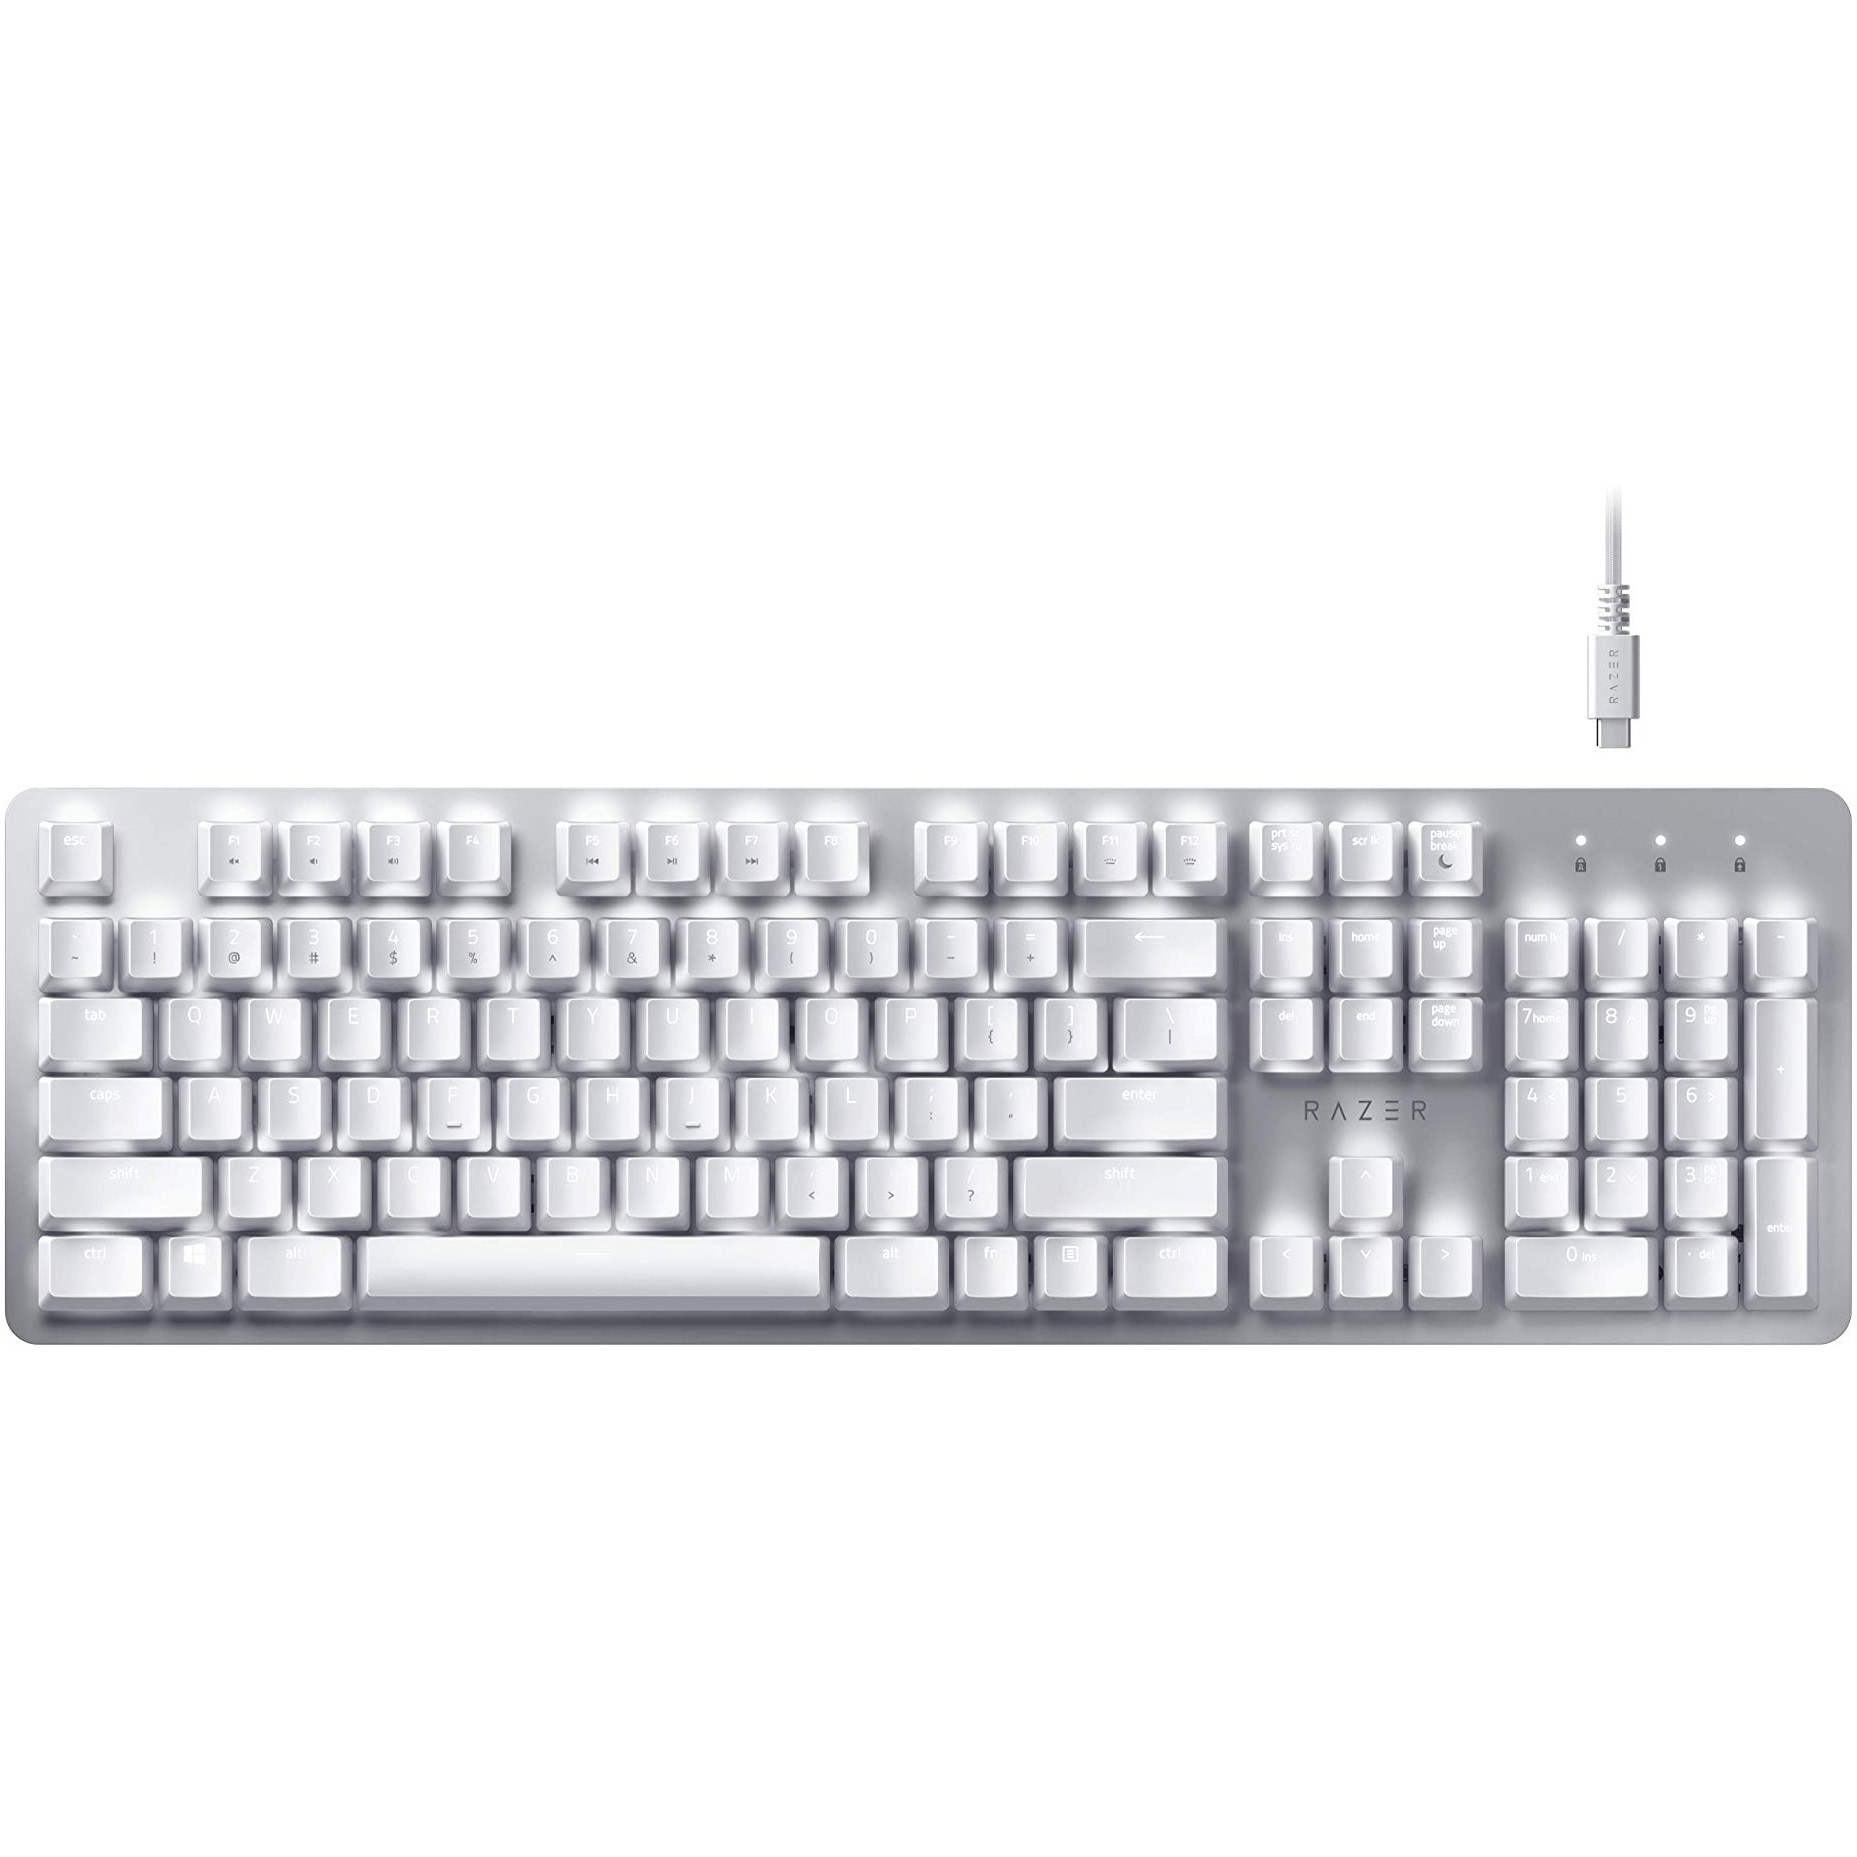 Fotografie Tastatura mecanica wireless Razer Pro Type, iluminare alb, multidevice, 2.4GHz&Bluetooth, USB-C, switch Razer Orange, US Layout